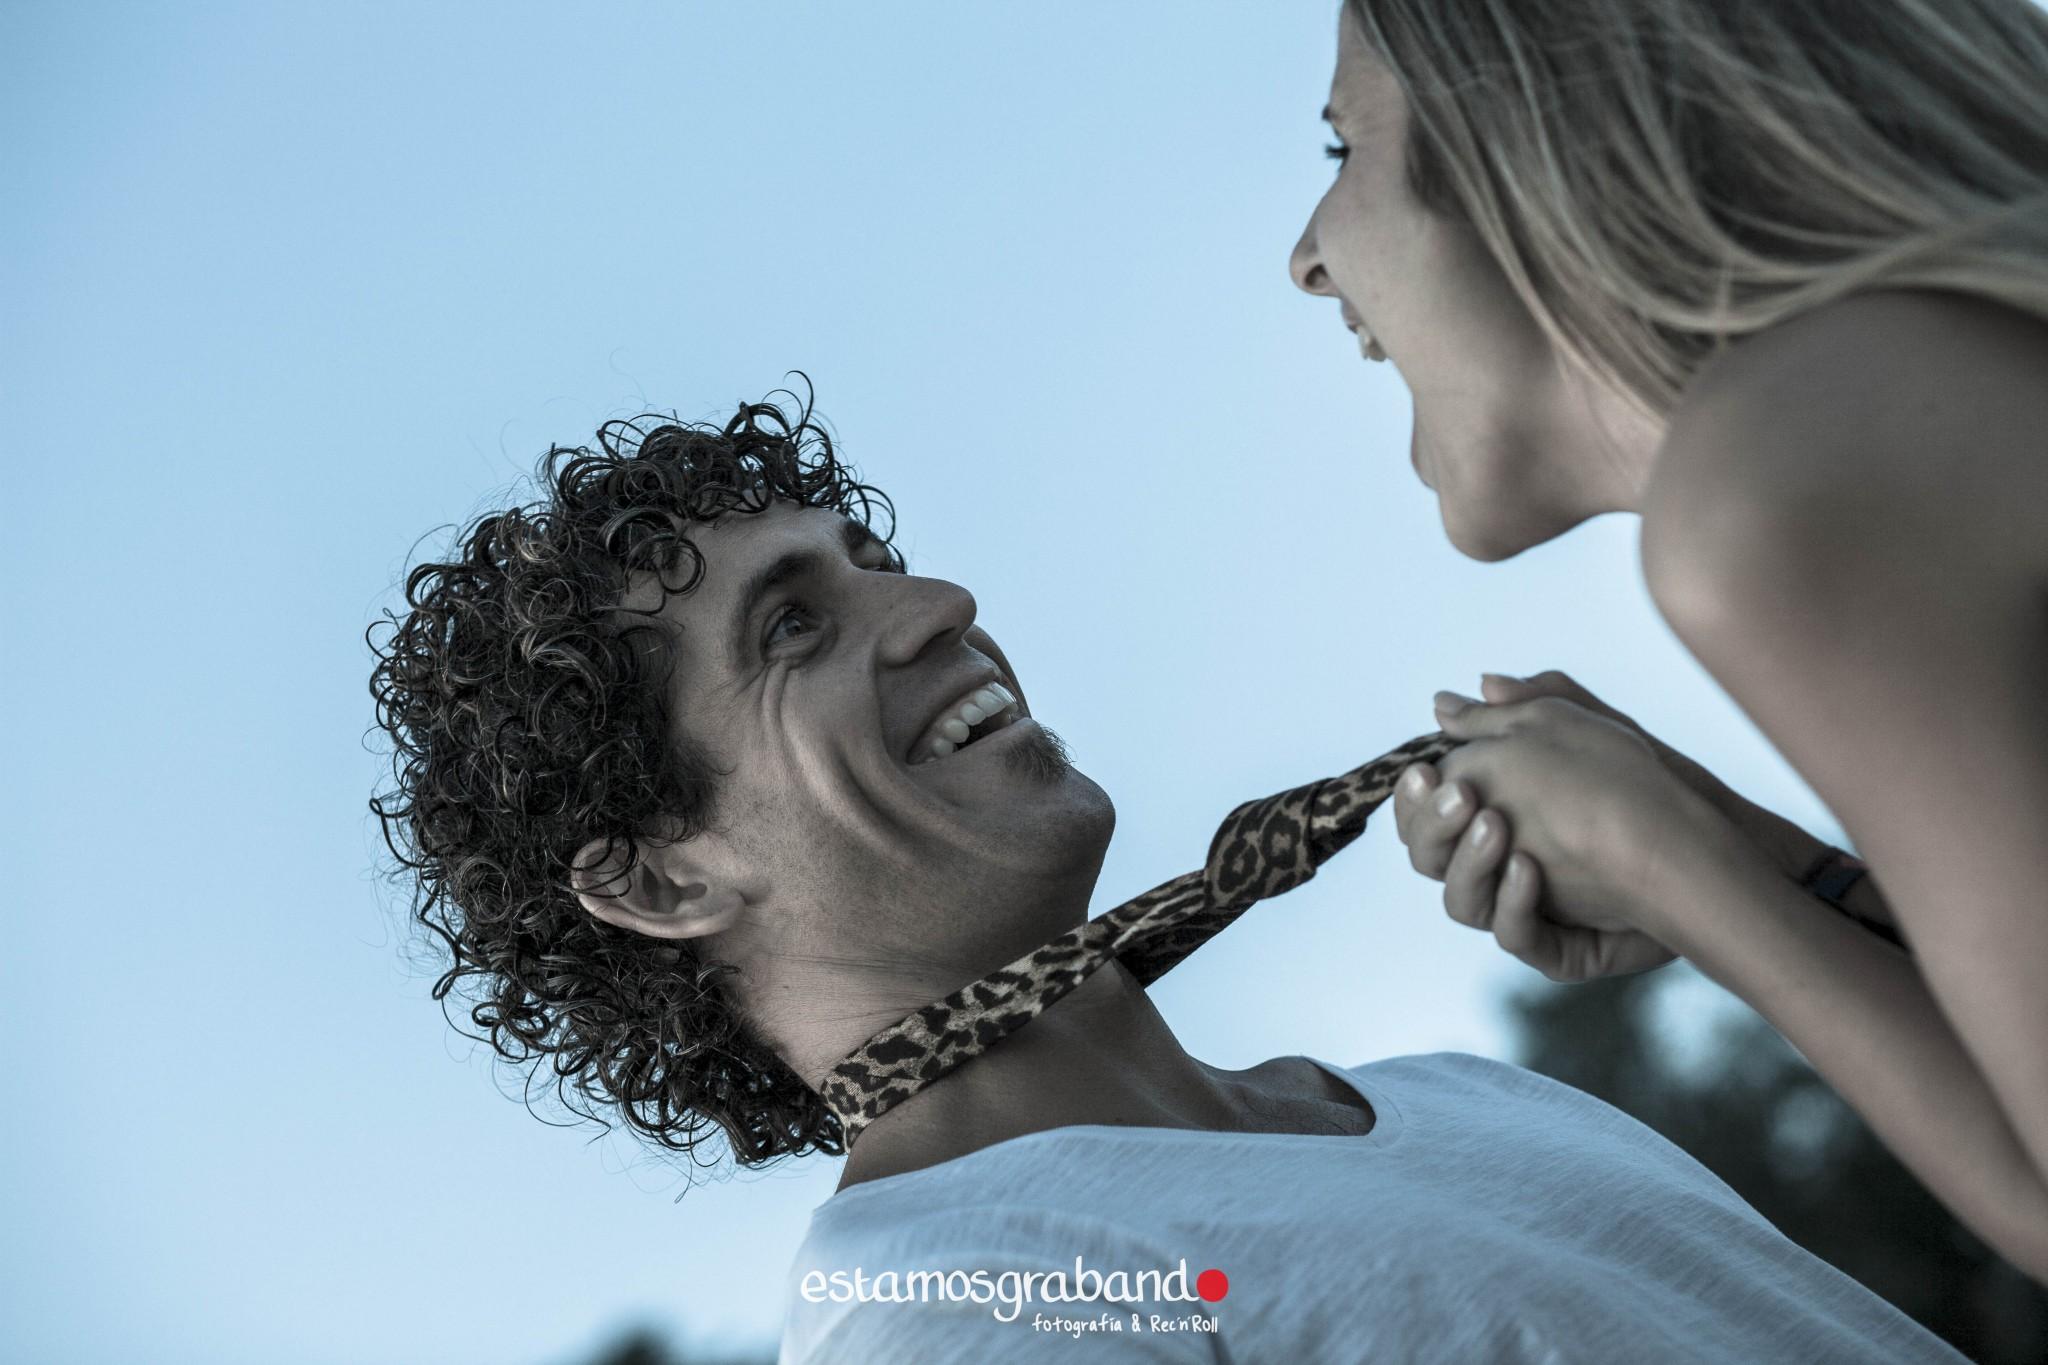 miriam-y-jesucc81s_preboda-blog-27 Surf & Love [Preboda Recandrolera_Miriam & Jesús] - video boda cadiz